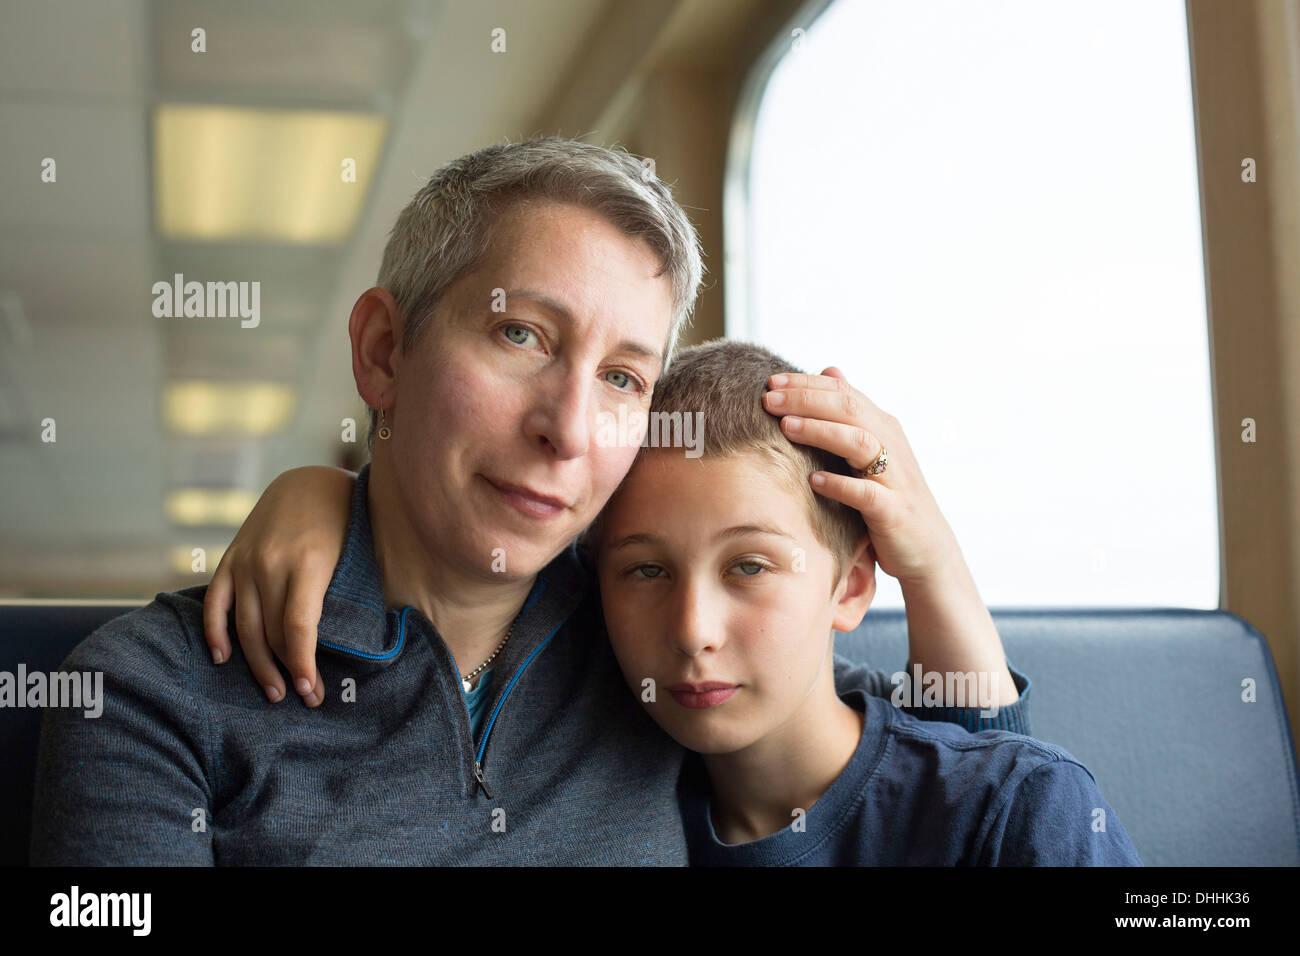 Madre e hijo sentado junto con brazo alrededor Imagen De Stock